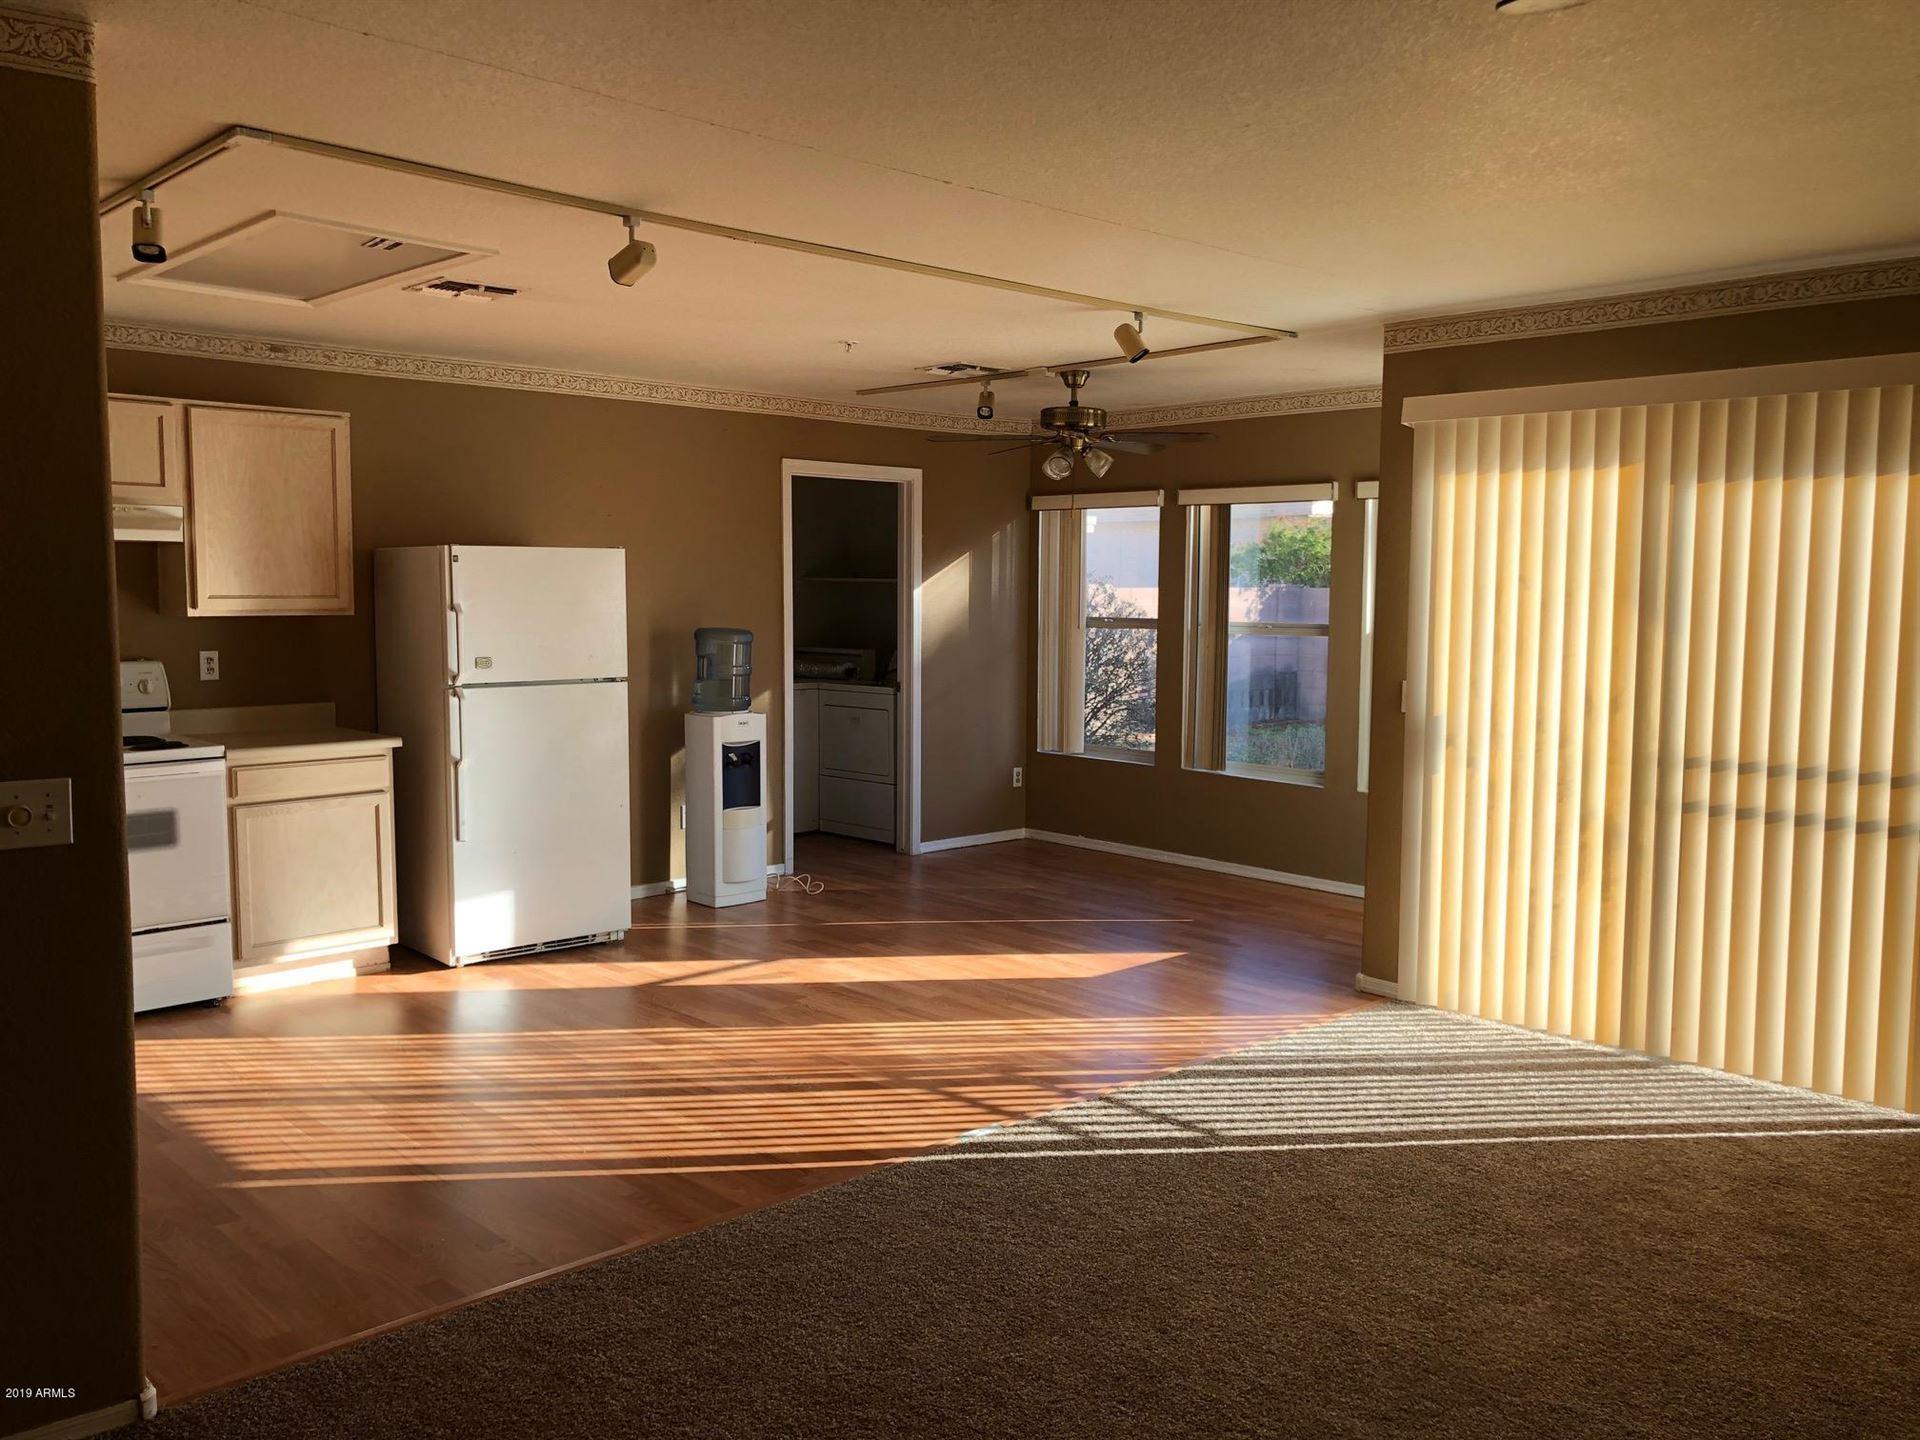 Photo of 11197 N 89TH Street, Scottsdale, AZ 85260 (MLS # 6232535)